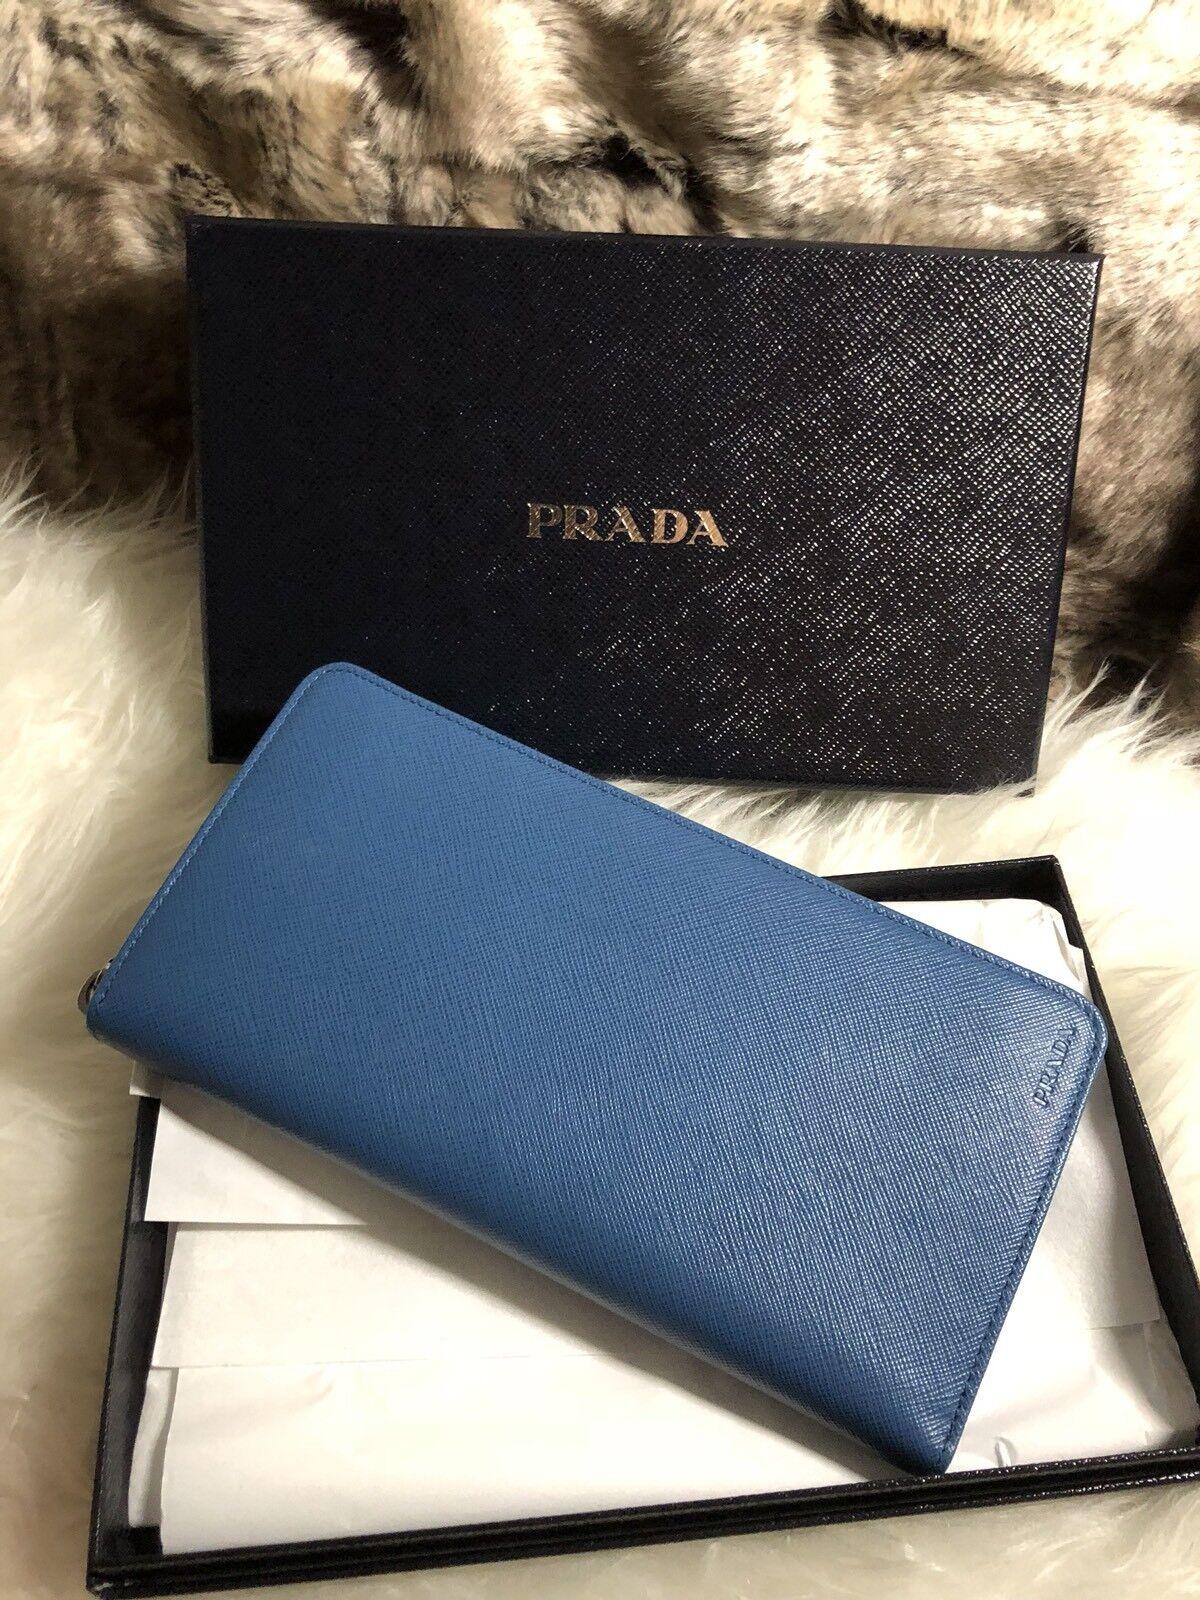 NWT Authentic Prada Mens Zip Around Wallet in Cobalto Blue Saffiano Leather